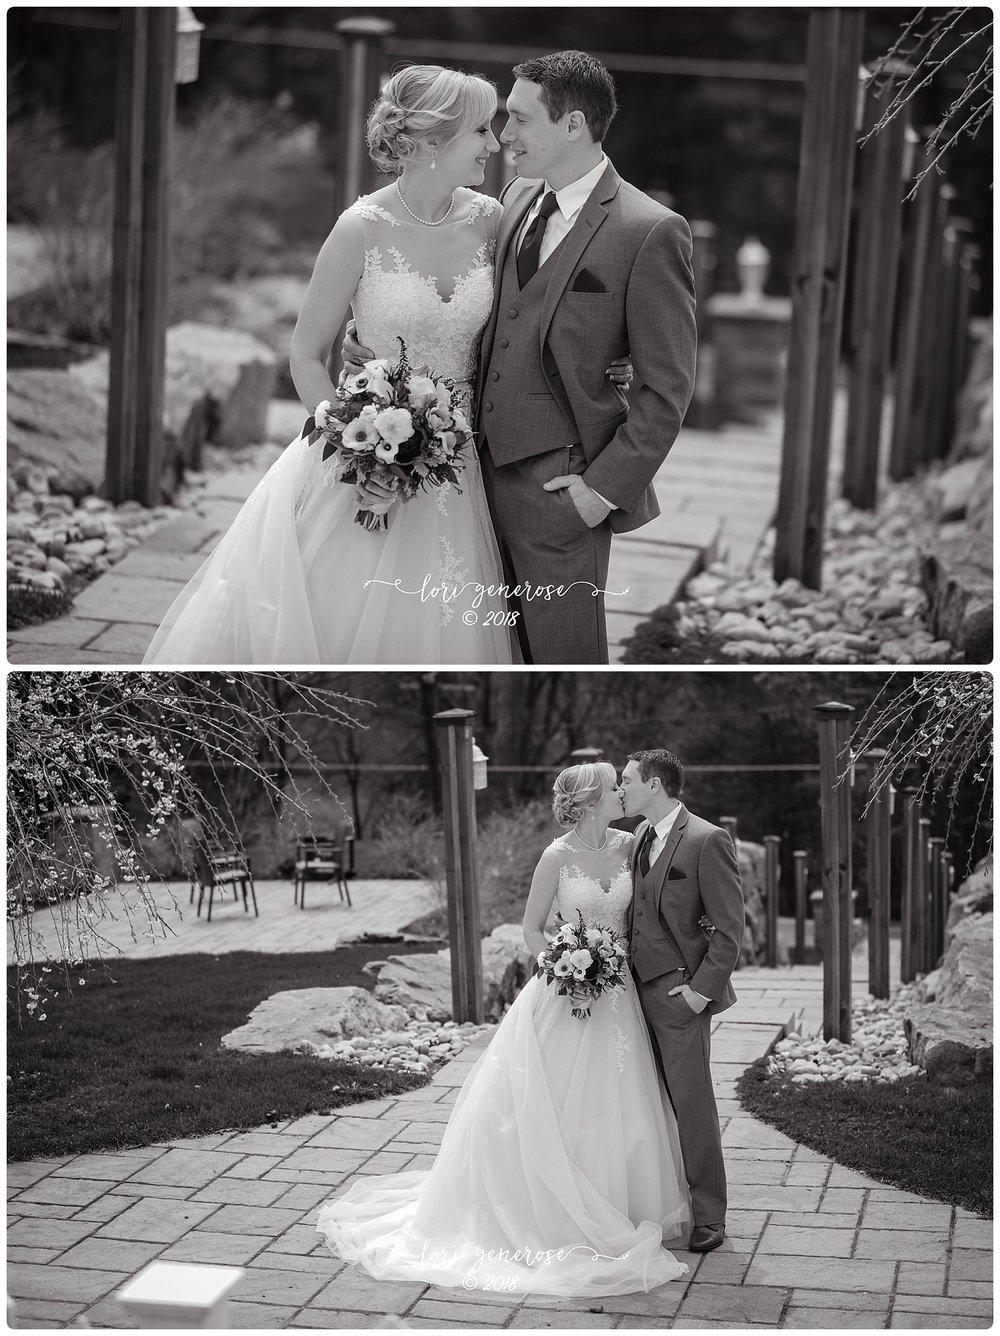 lgphotographylorigenerosetheinnatpoconomanorpaweddingvenuebridegroomkissblackandwhite.jpg